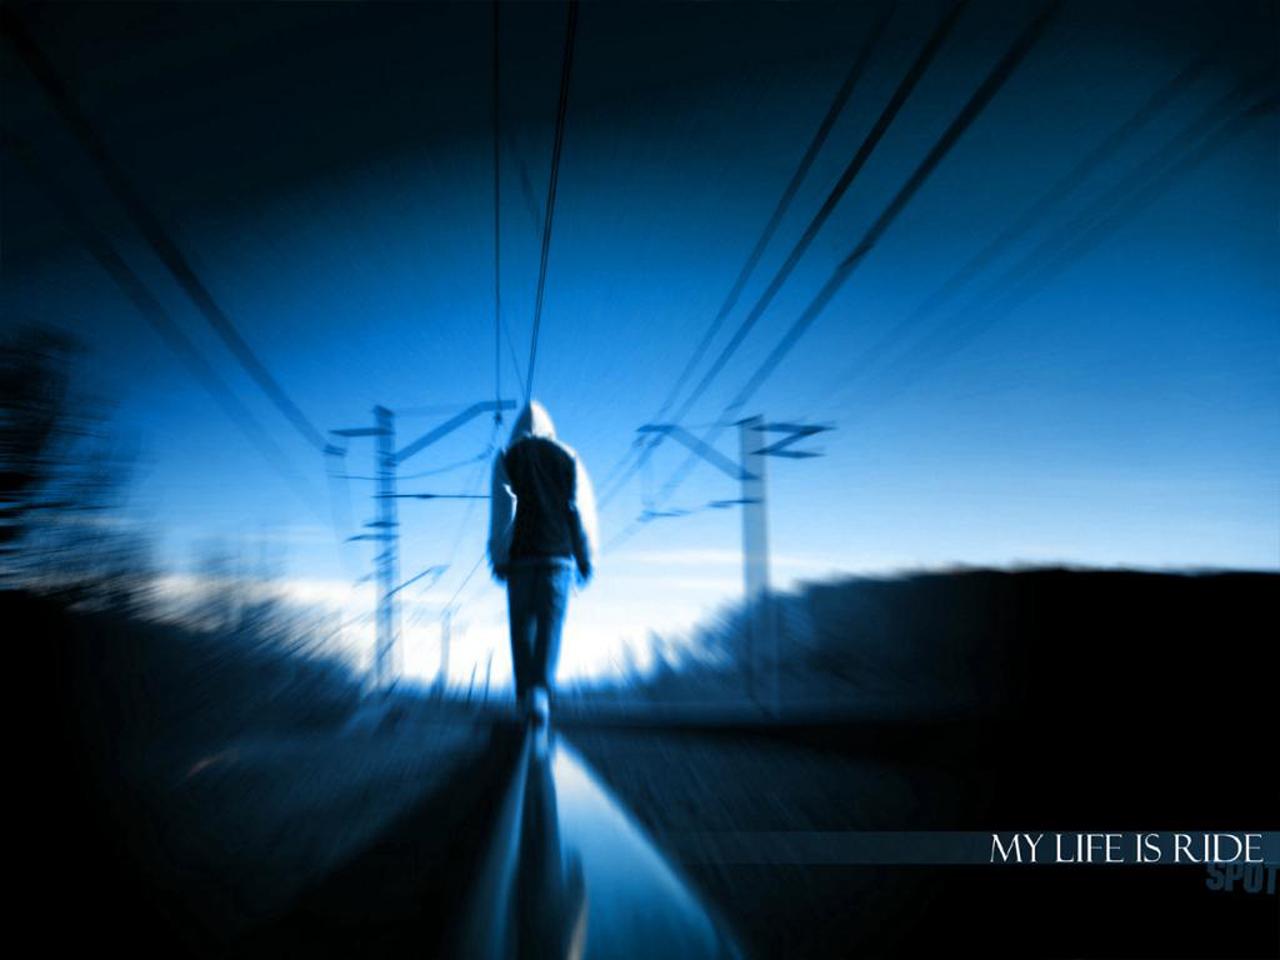 http://www.zastavki.com/pictures/1280x800/2009/Emo_Emo_Lifestyle_011776_.jpg